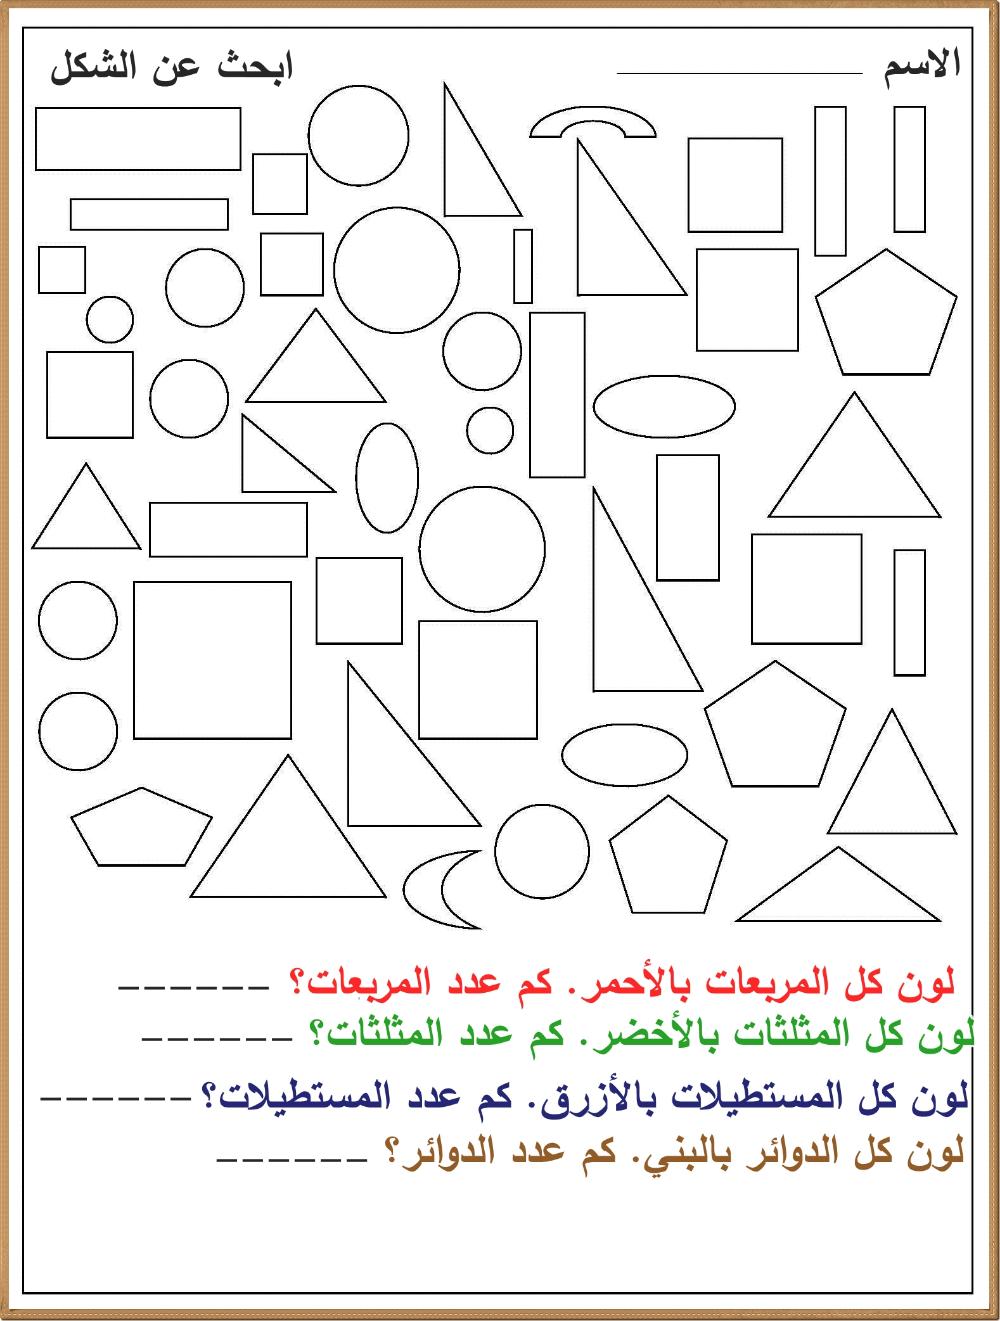 Resultats Google Recherche D Images Correspondant A Https Teacher1maitha Files Wordpress Com 2012 09 Sha Learning Arabic Learn Arabic Online Math Worksheets